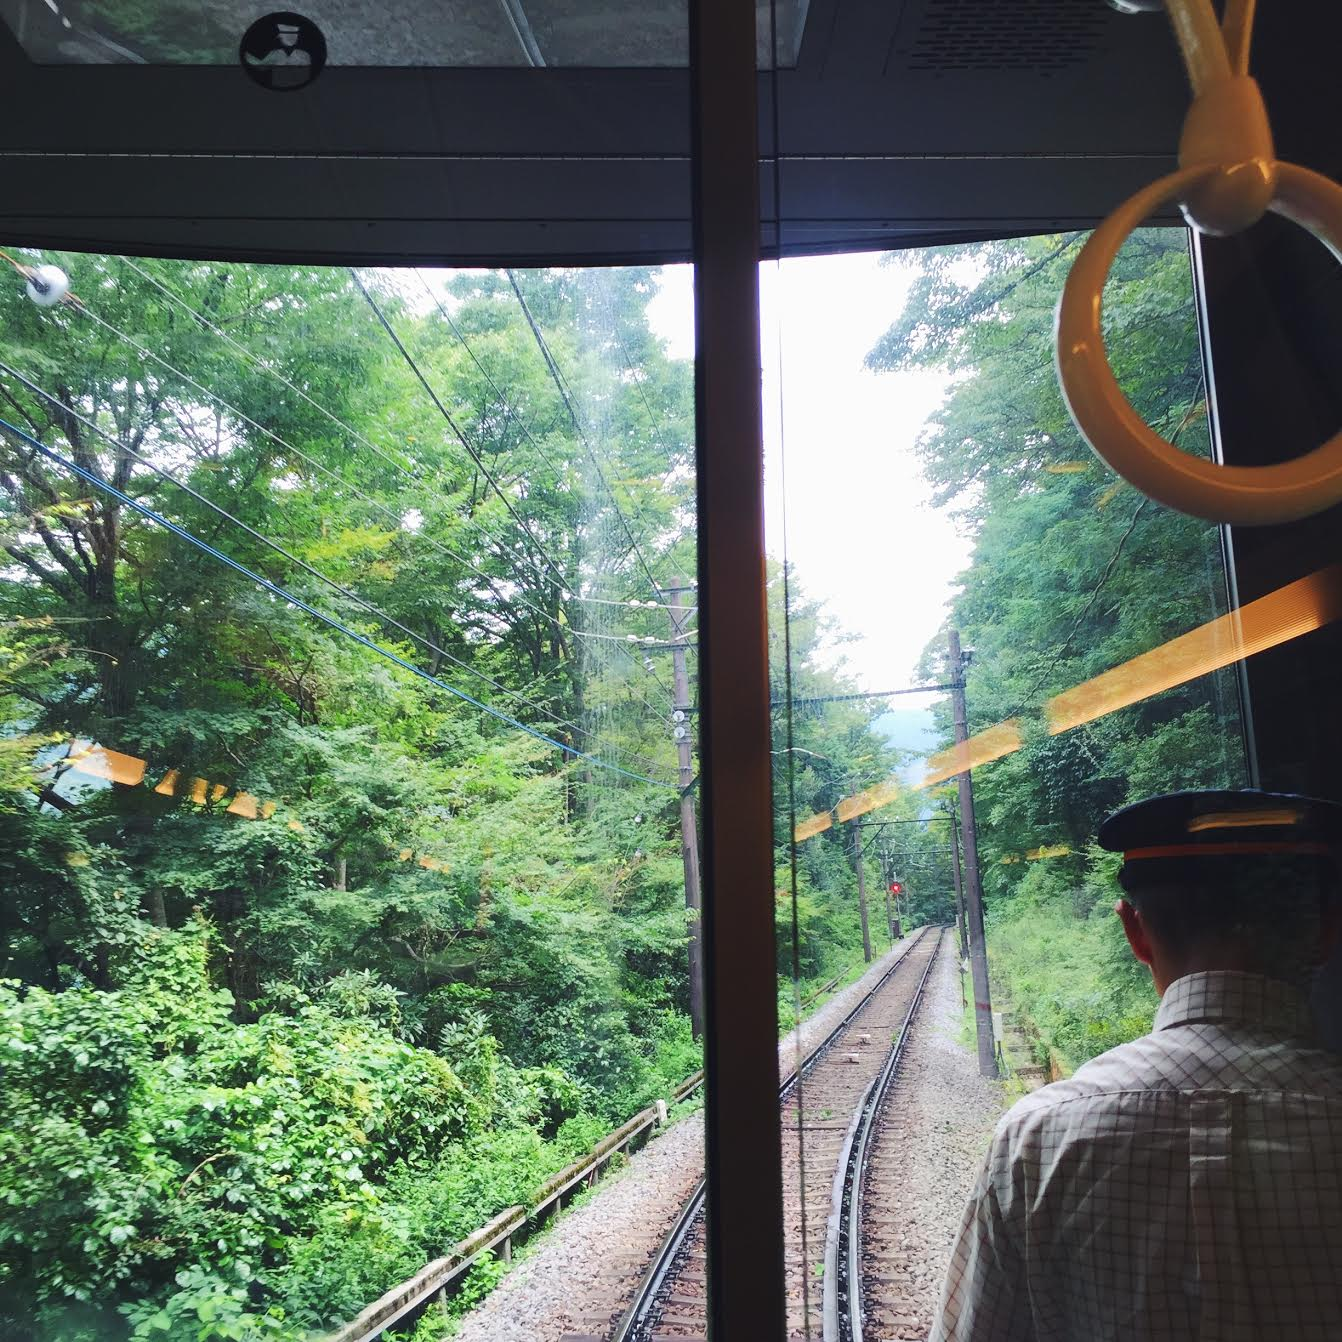 Muslim-travel-Hakone-Japan-tram-ride.jpg